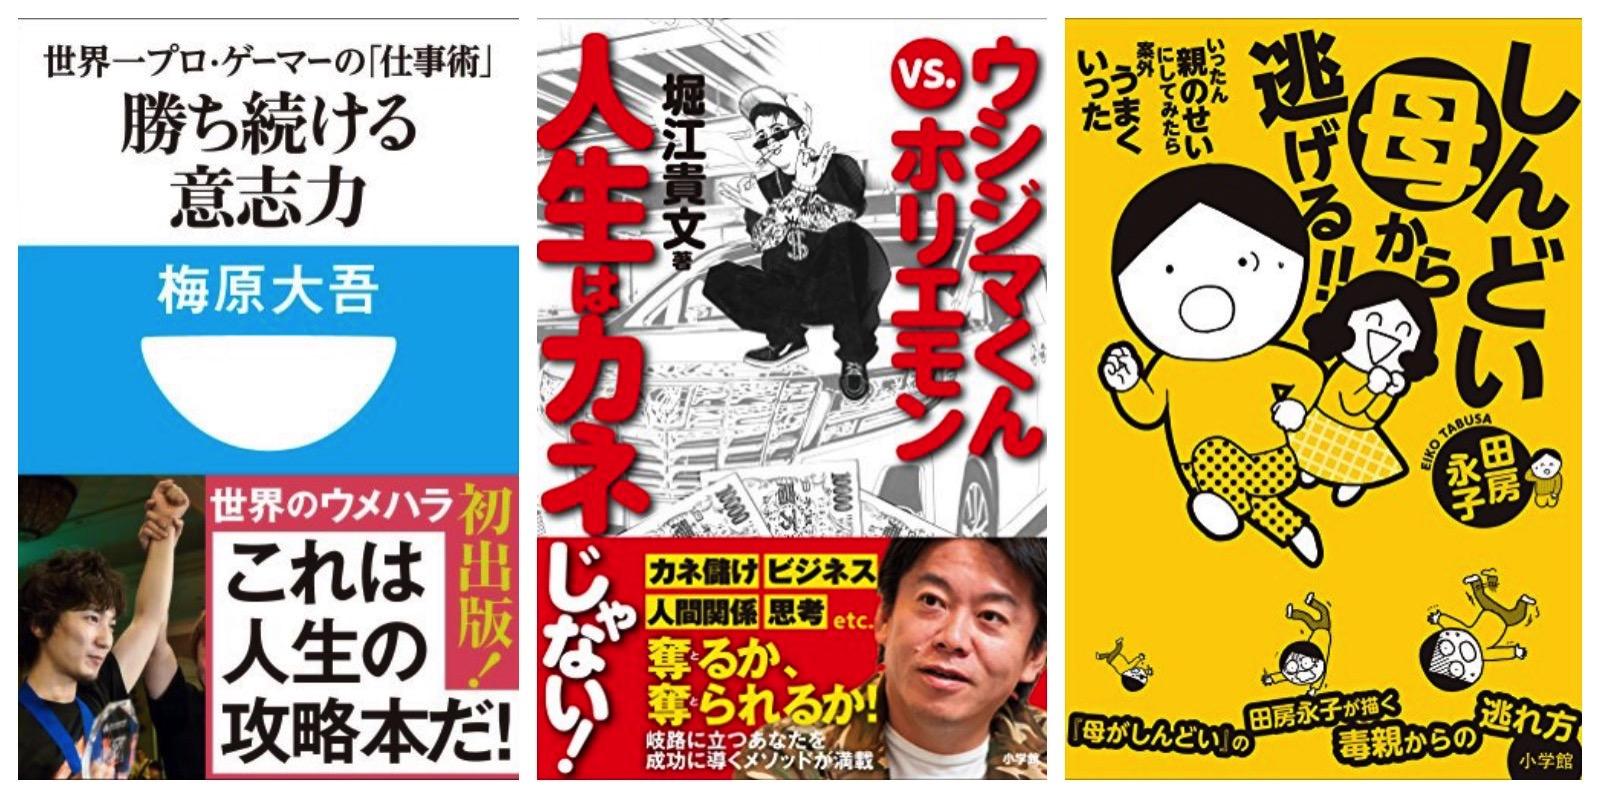 Shogakukan Kindle GW sale